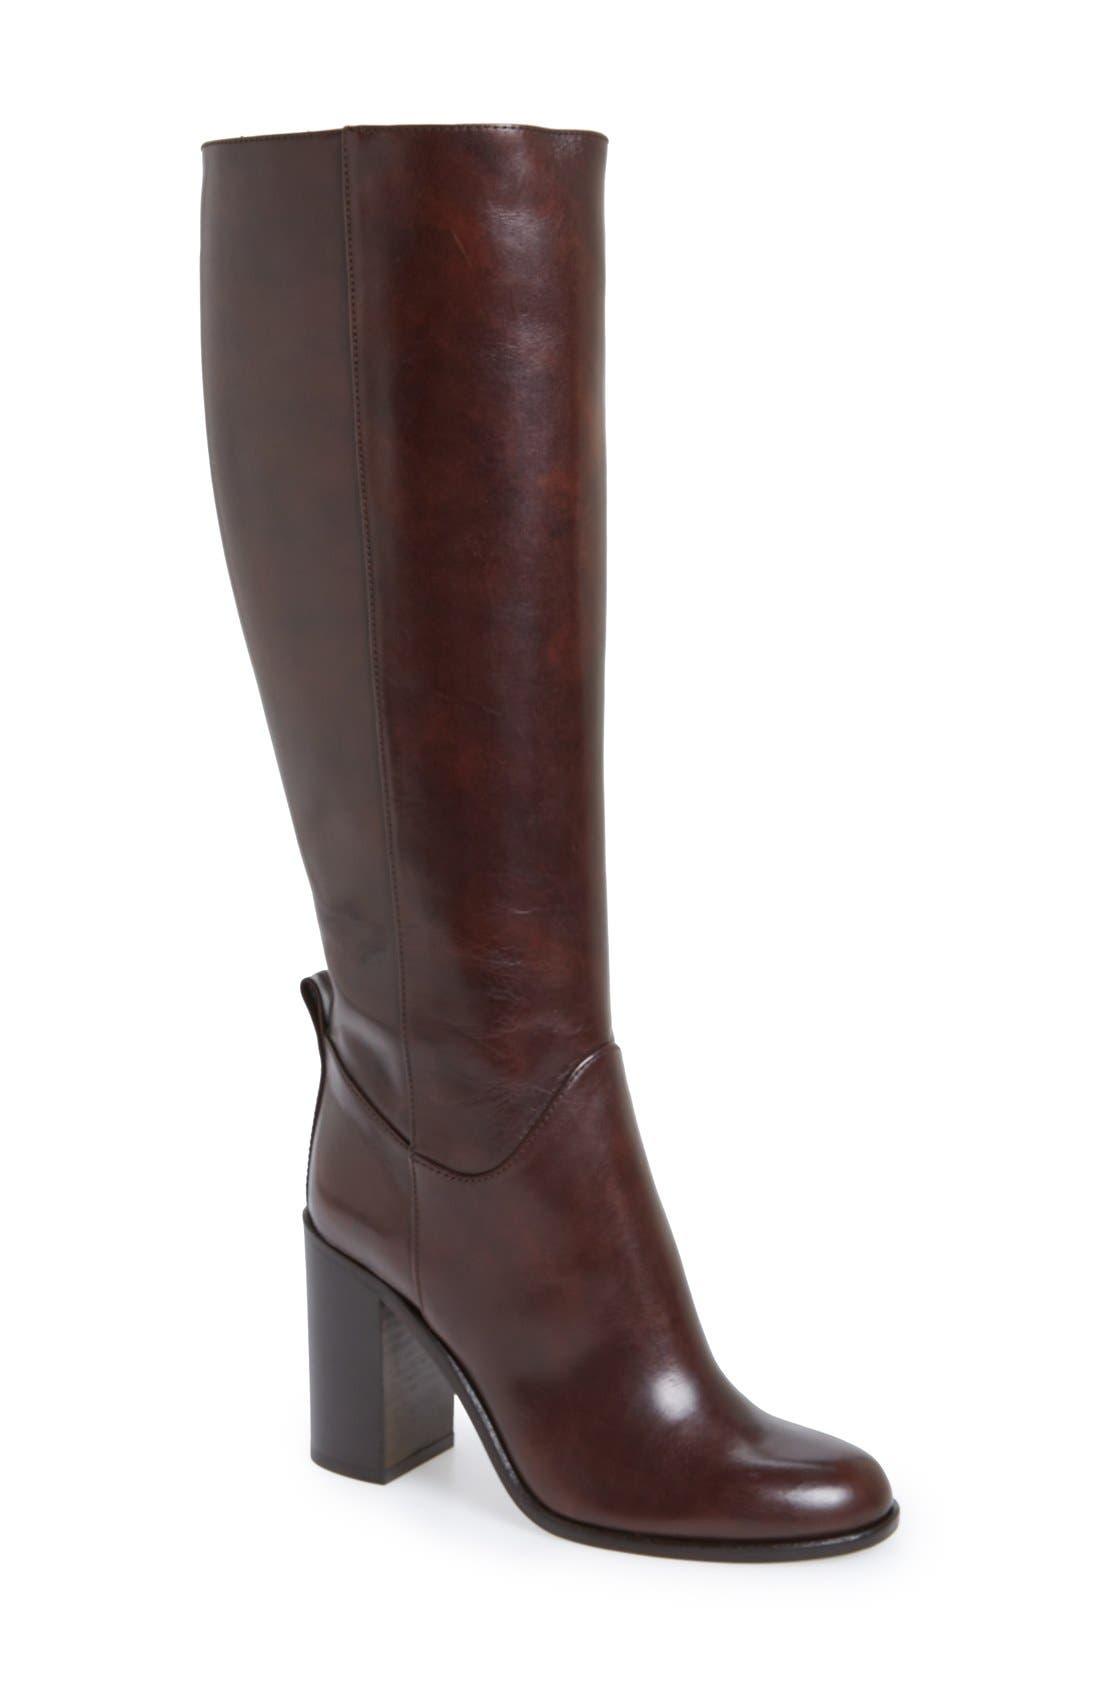 Alternate Image 1 Selected - kate spade new york 'baina' tall boot (Women)